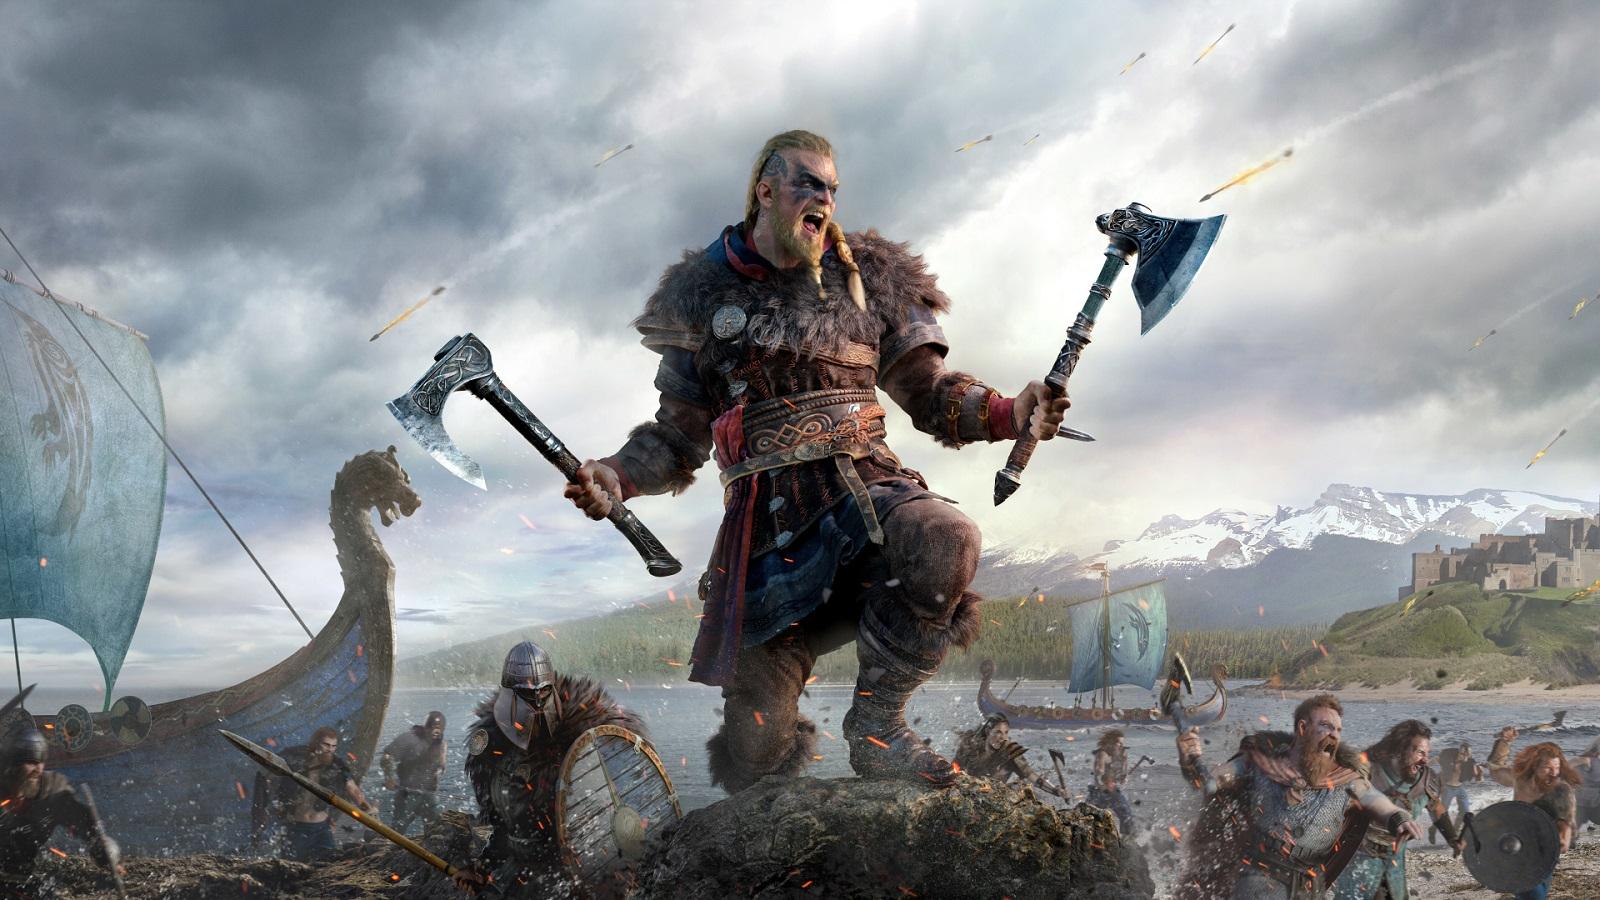 Assassin's Creed Valhalla войдет в стартовую линейку Xbox Series X | S